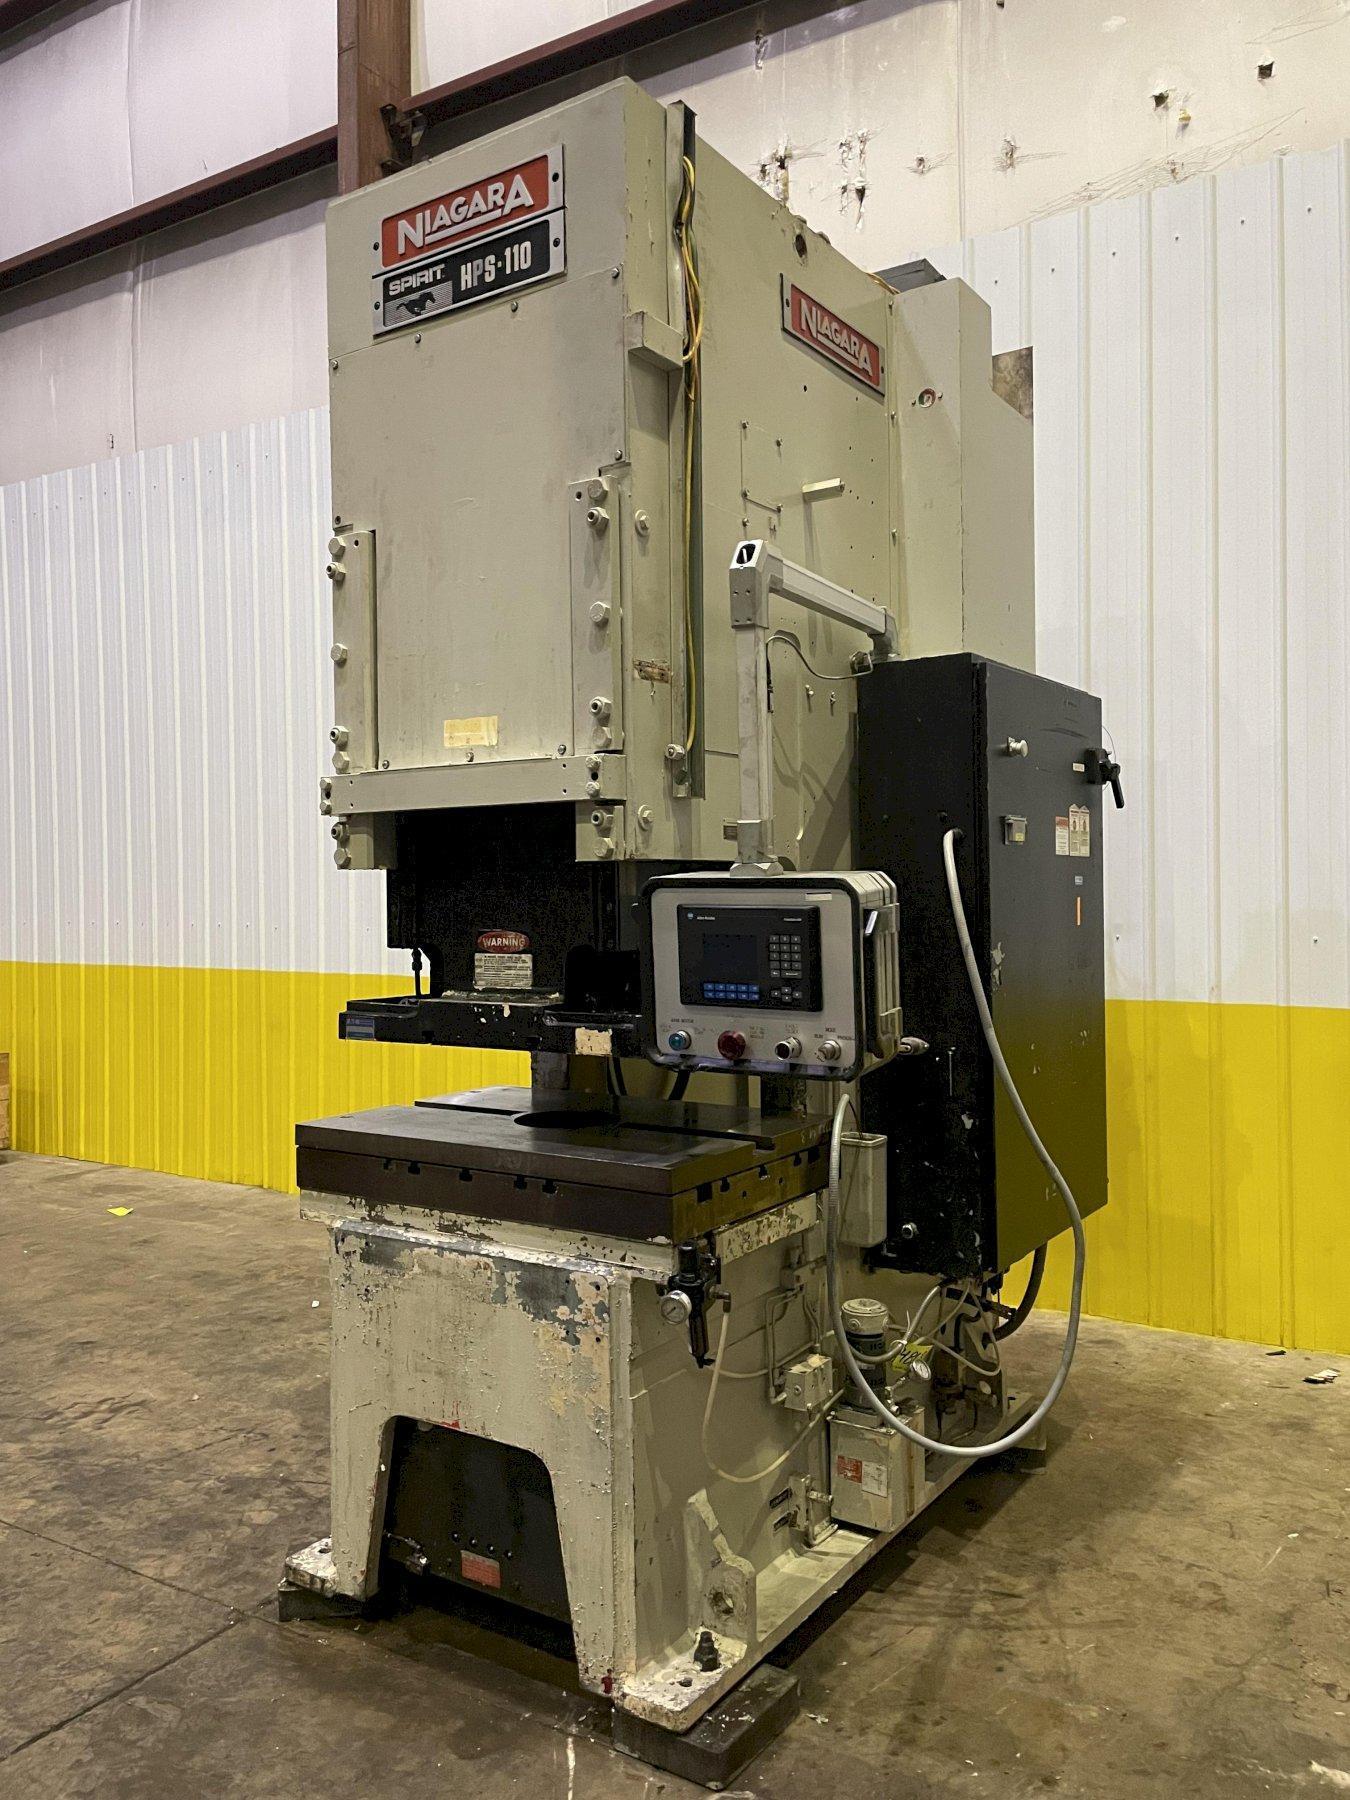 120 TON NIAGARA MODEL HPS-110 HYDRAULC C-FRAME PRESS: STOCK #14868